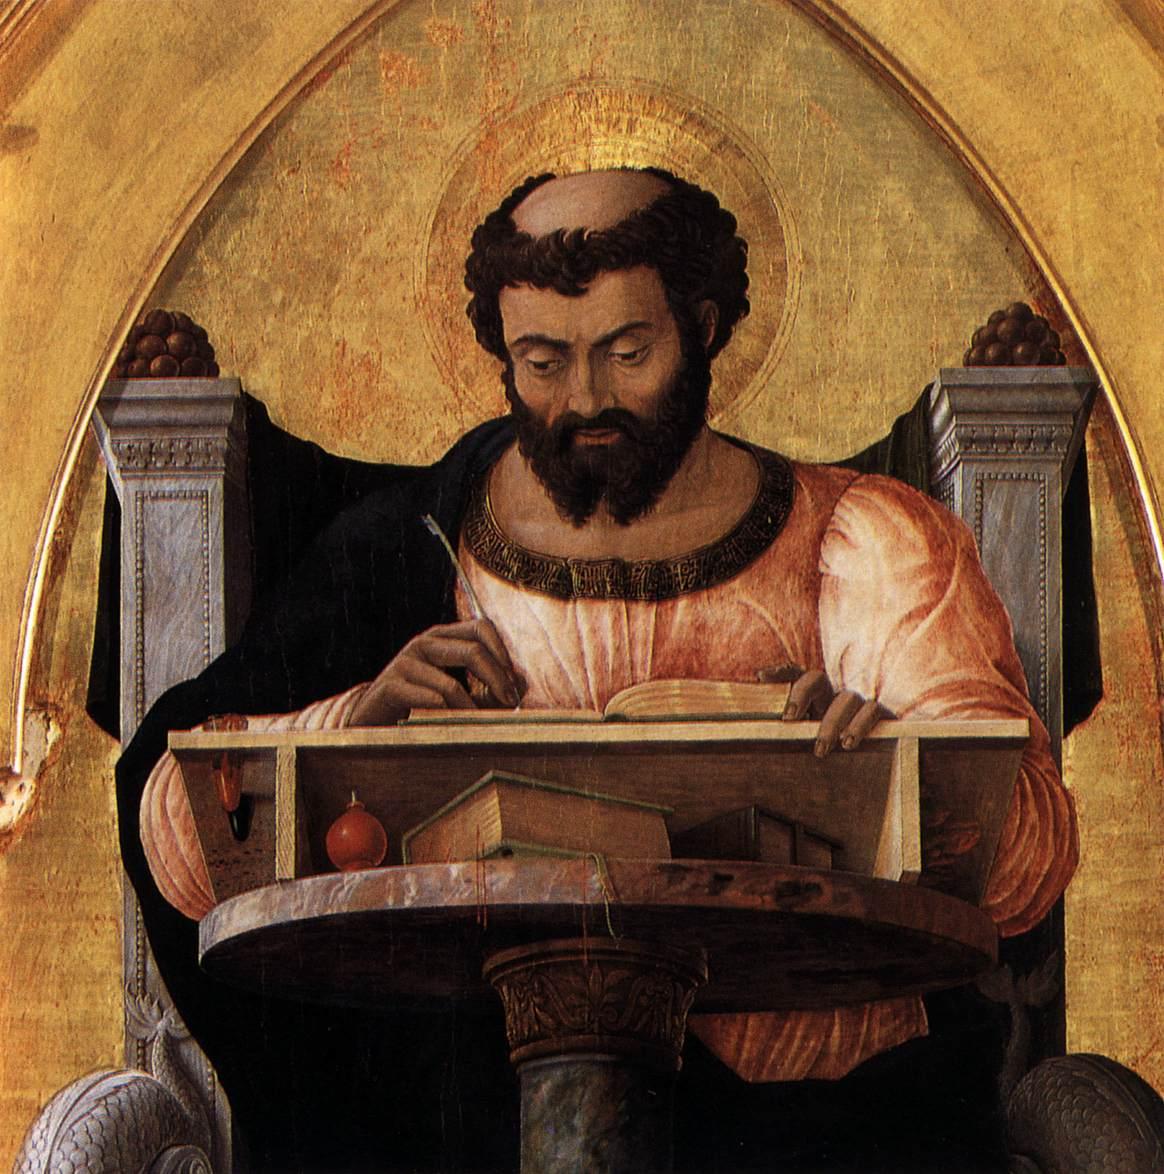 http://www.wga.hu/art/m/mantegna/02/sanluca6.jpg